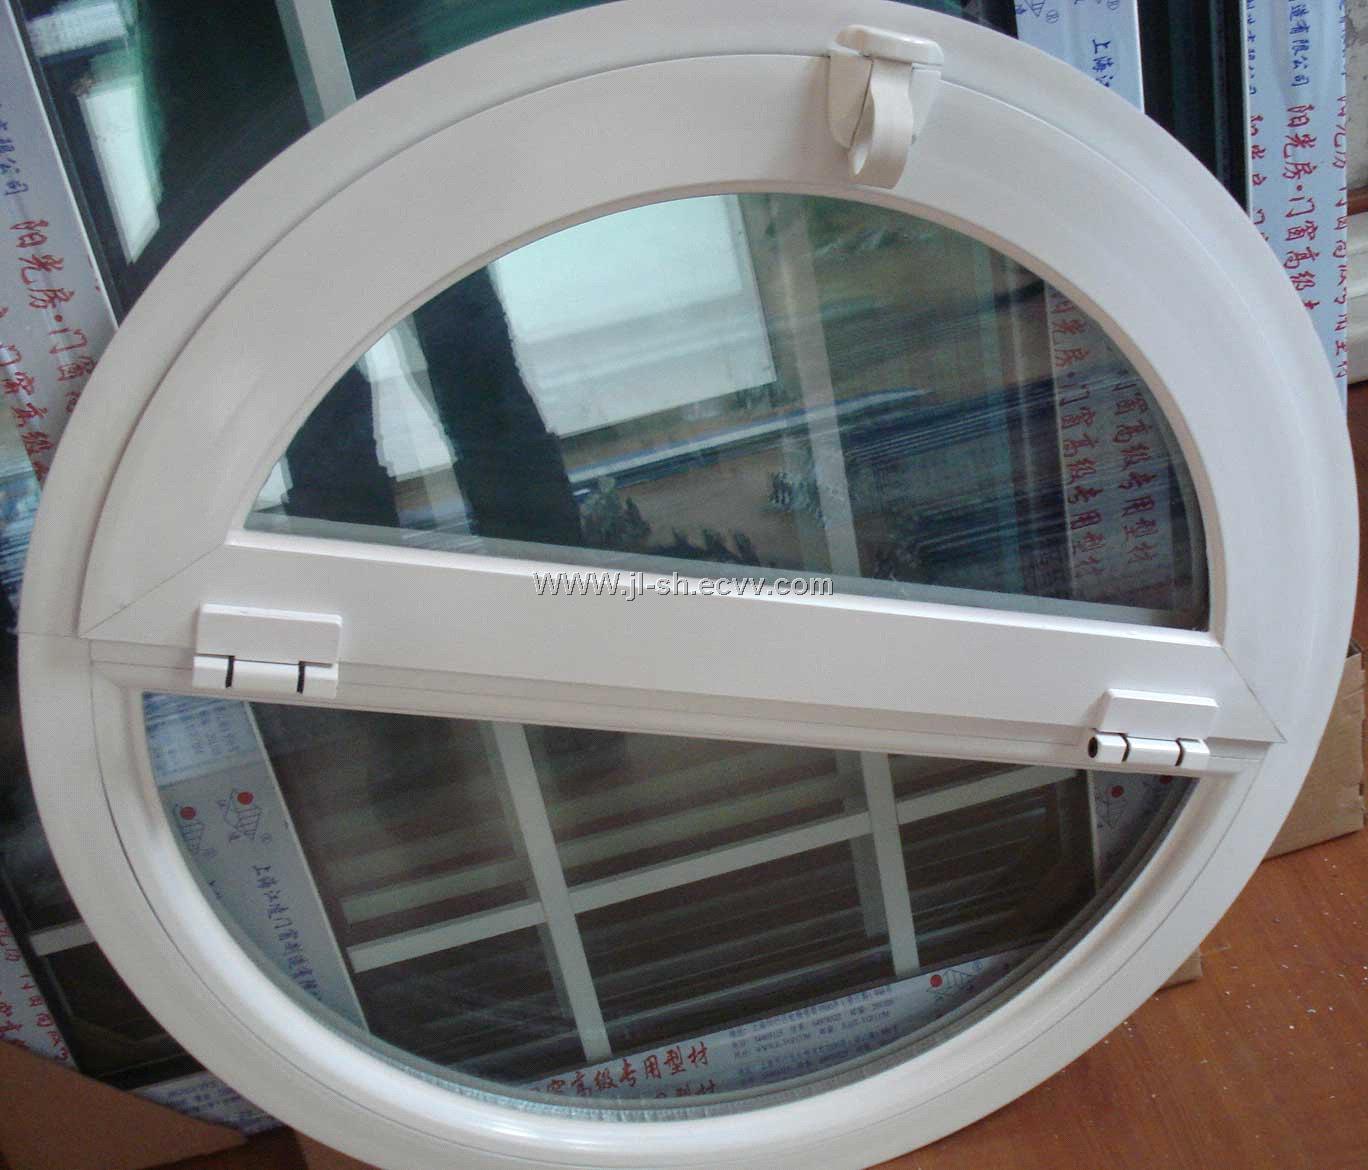 China Aluminum Window : Aluminum window in china